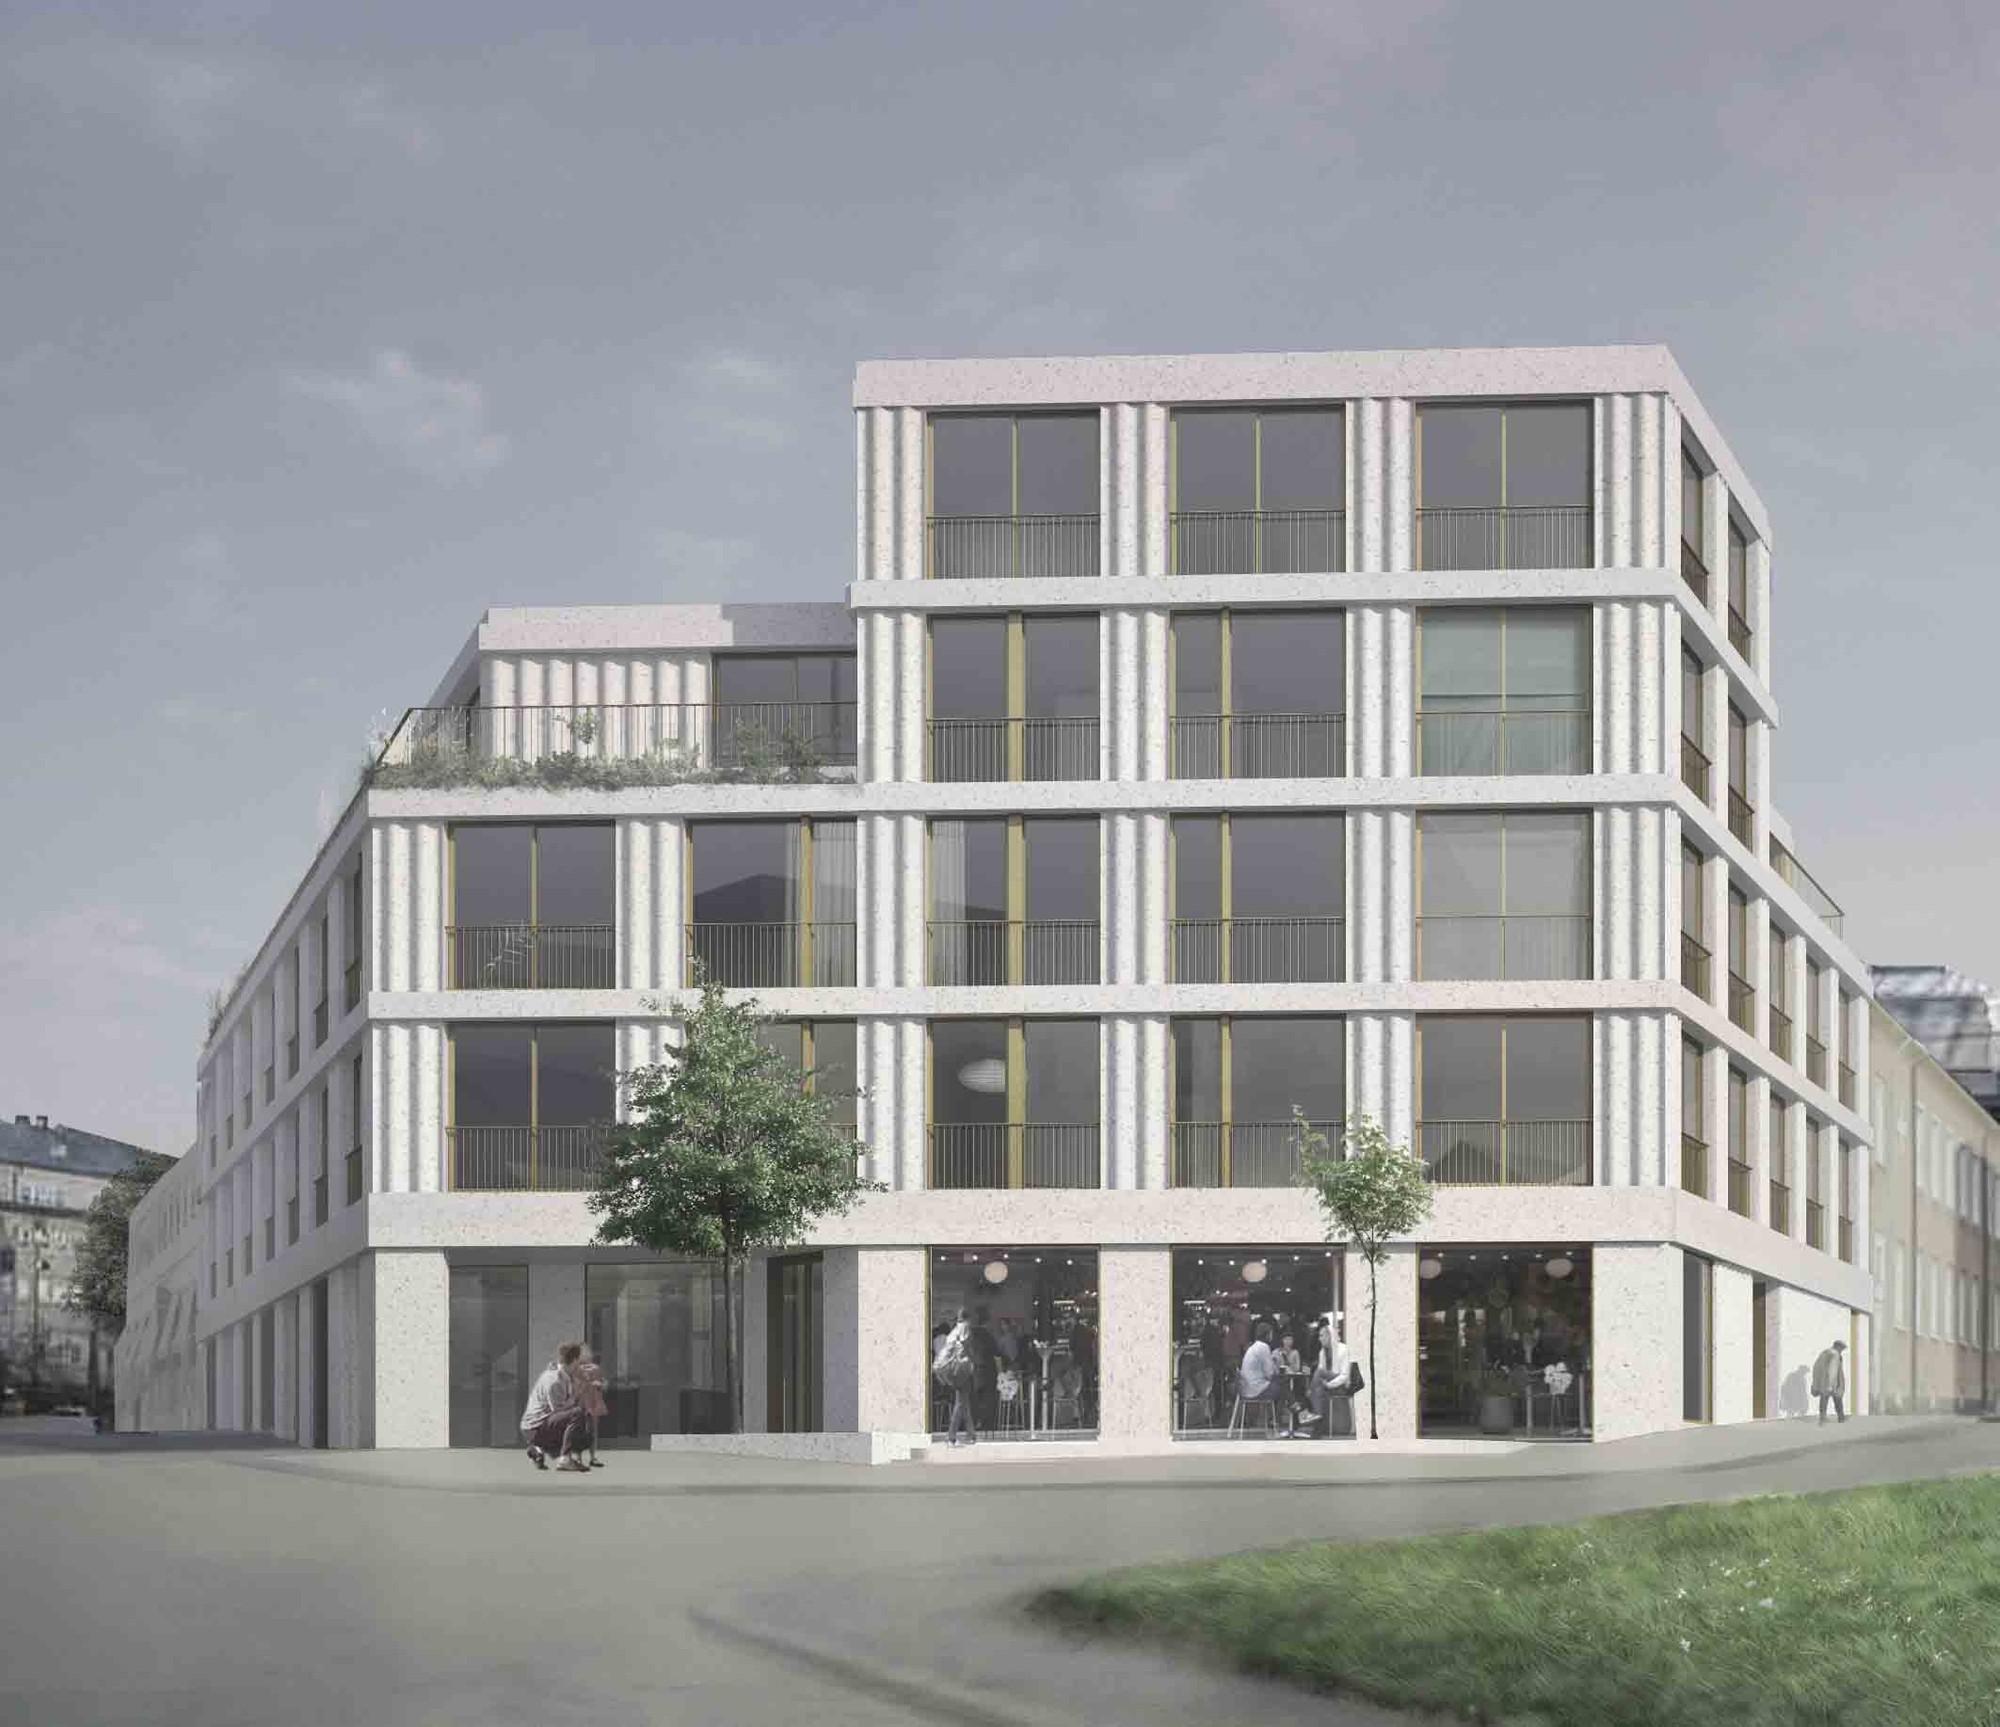 Urban Housing Winning Proposal /  ETAT Architects + Spridd Architects, Courtesy of ETAT Architects + Spridd Architects